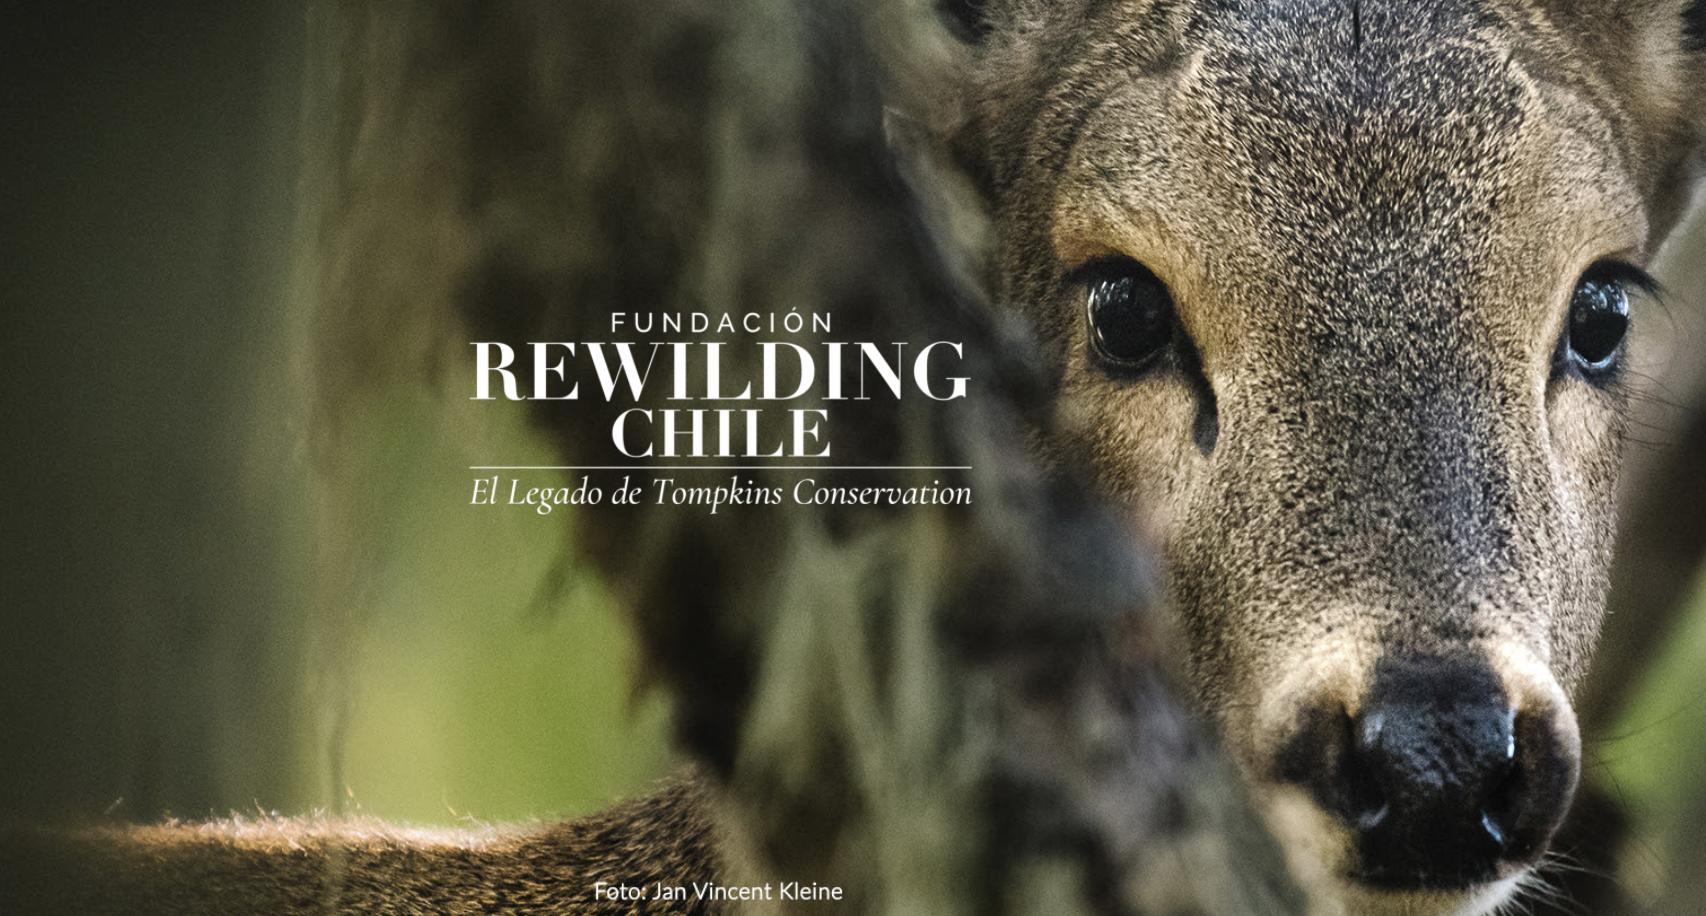 Rewilding Chile